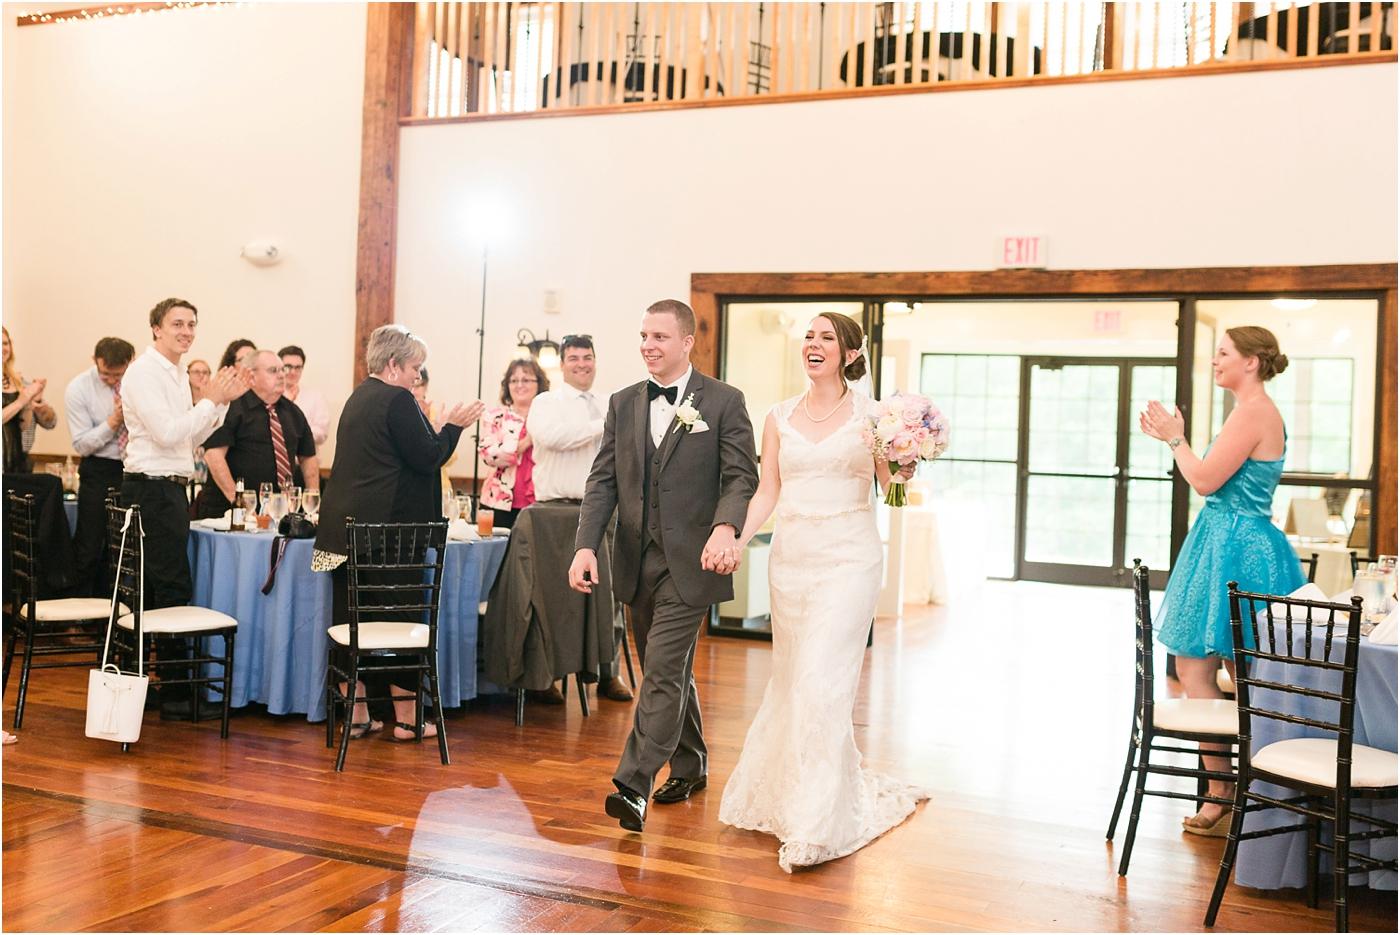 Gettysburg-lodges-wedding-photos-88.jpg